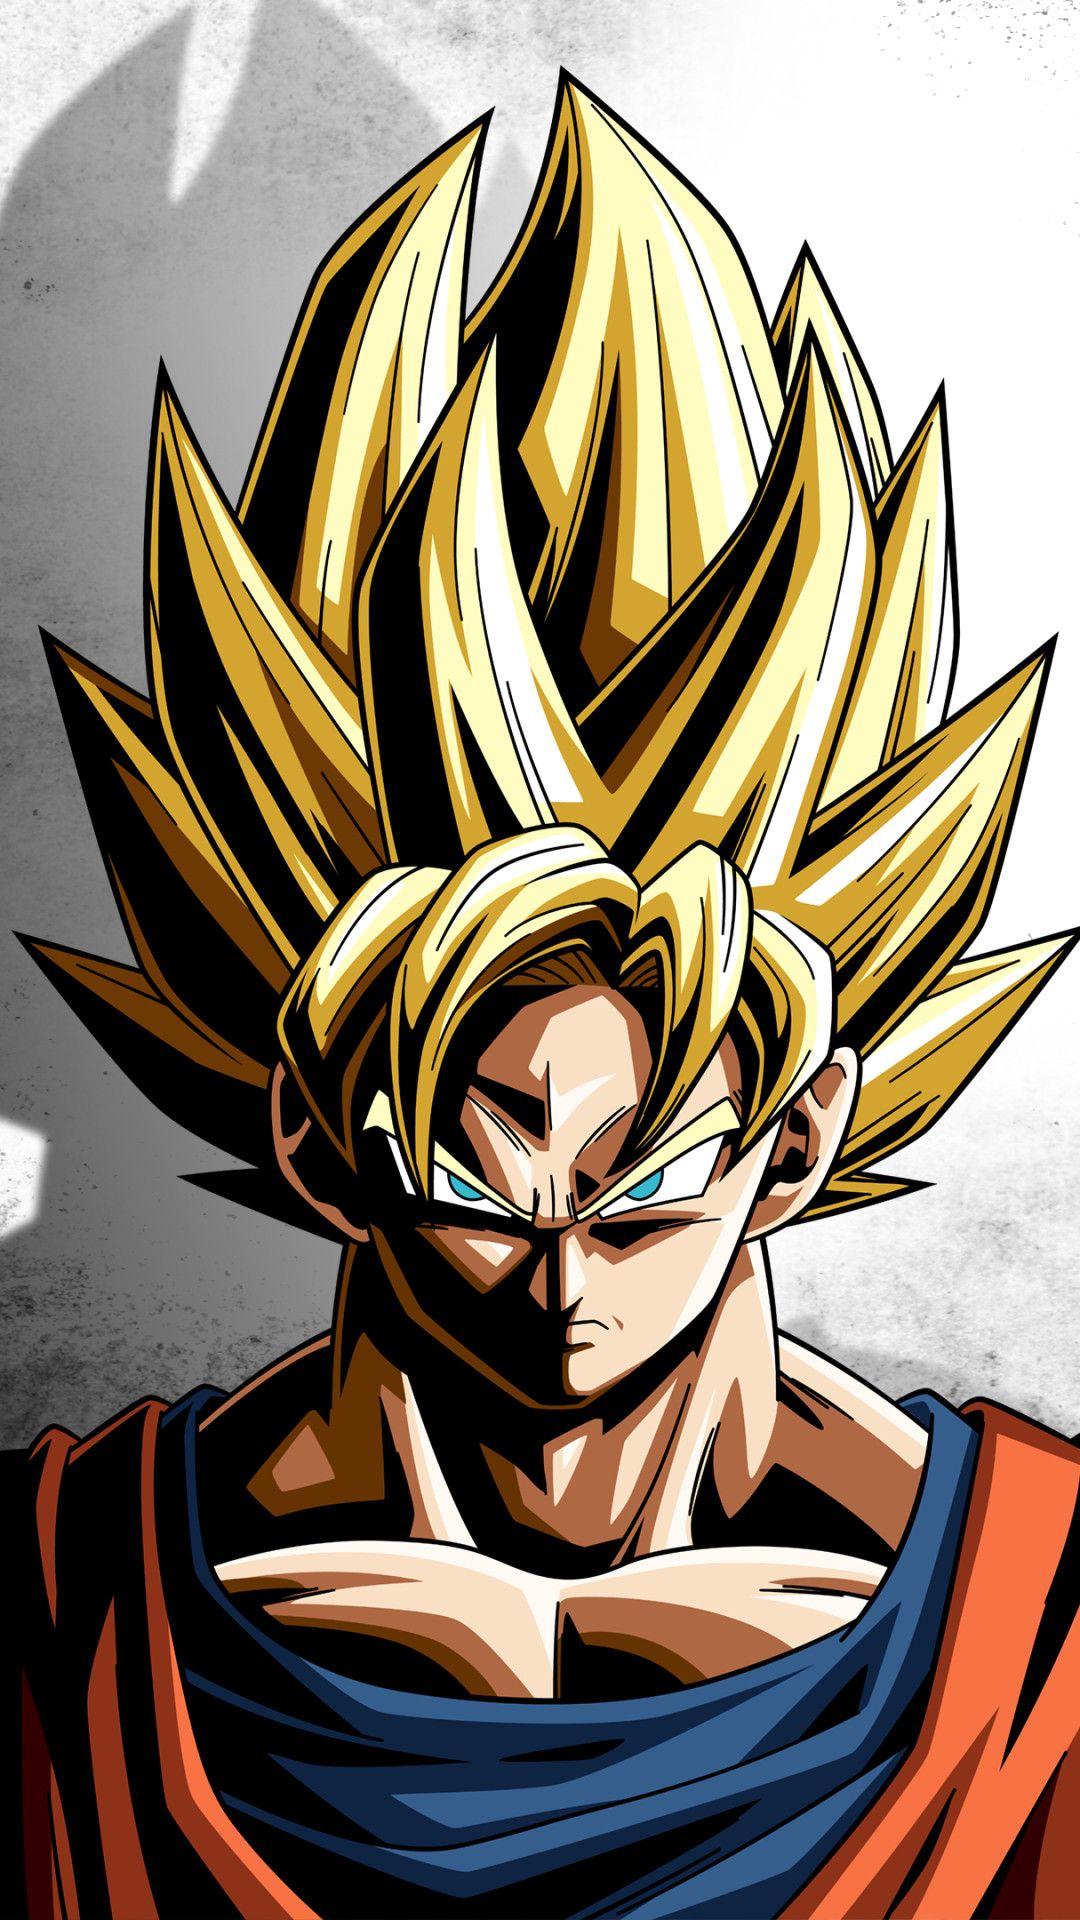 Dragon Ball Z Goku Wallpaper Iphone